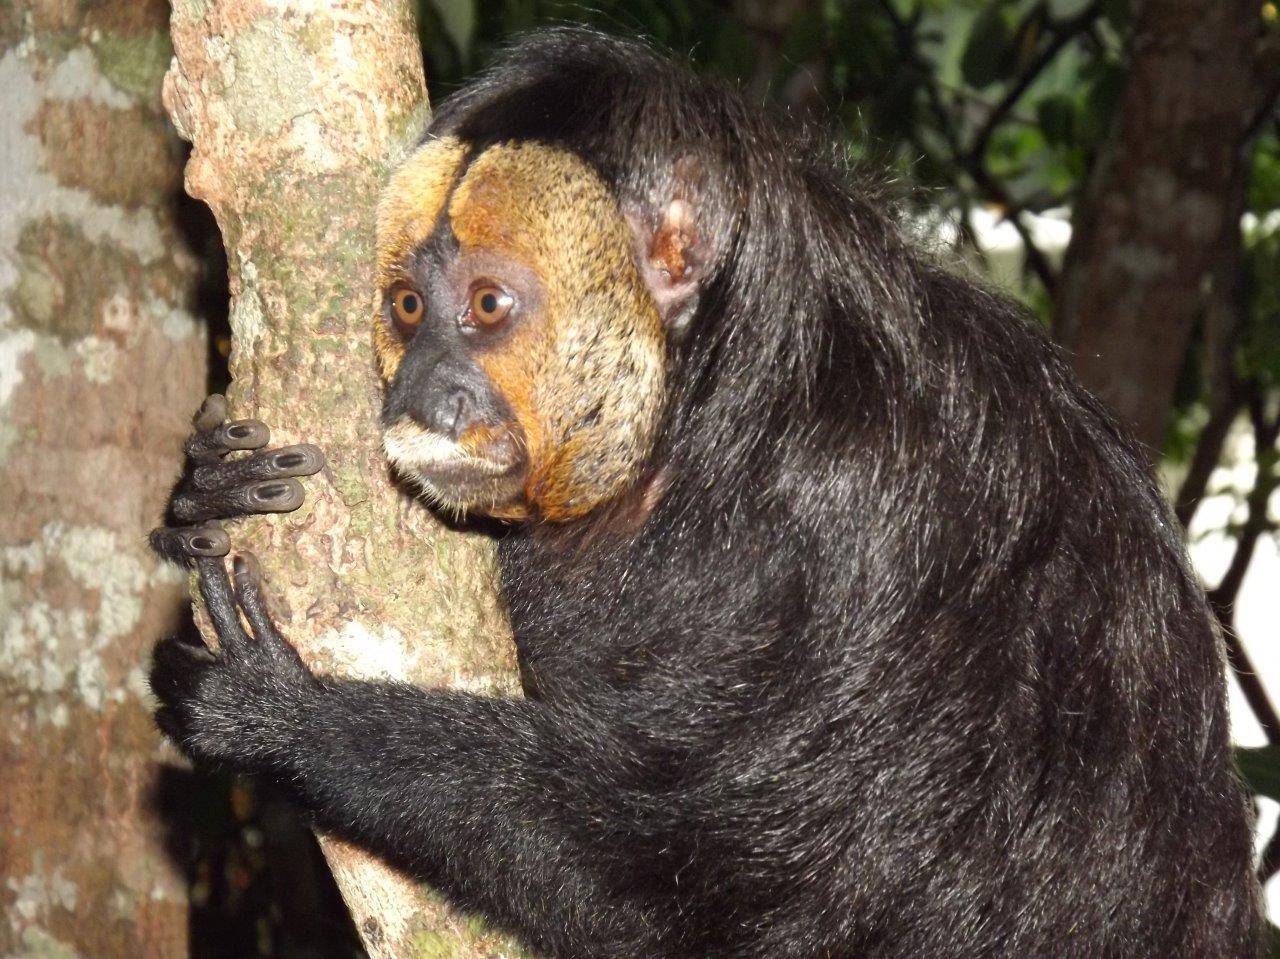 Macaco Parauacu Negro - Black Saki Monkey (1).jpg